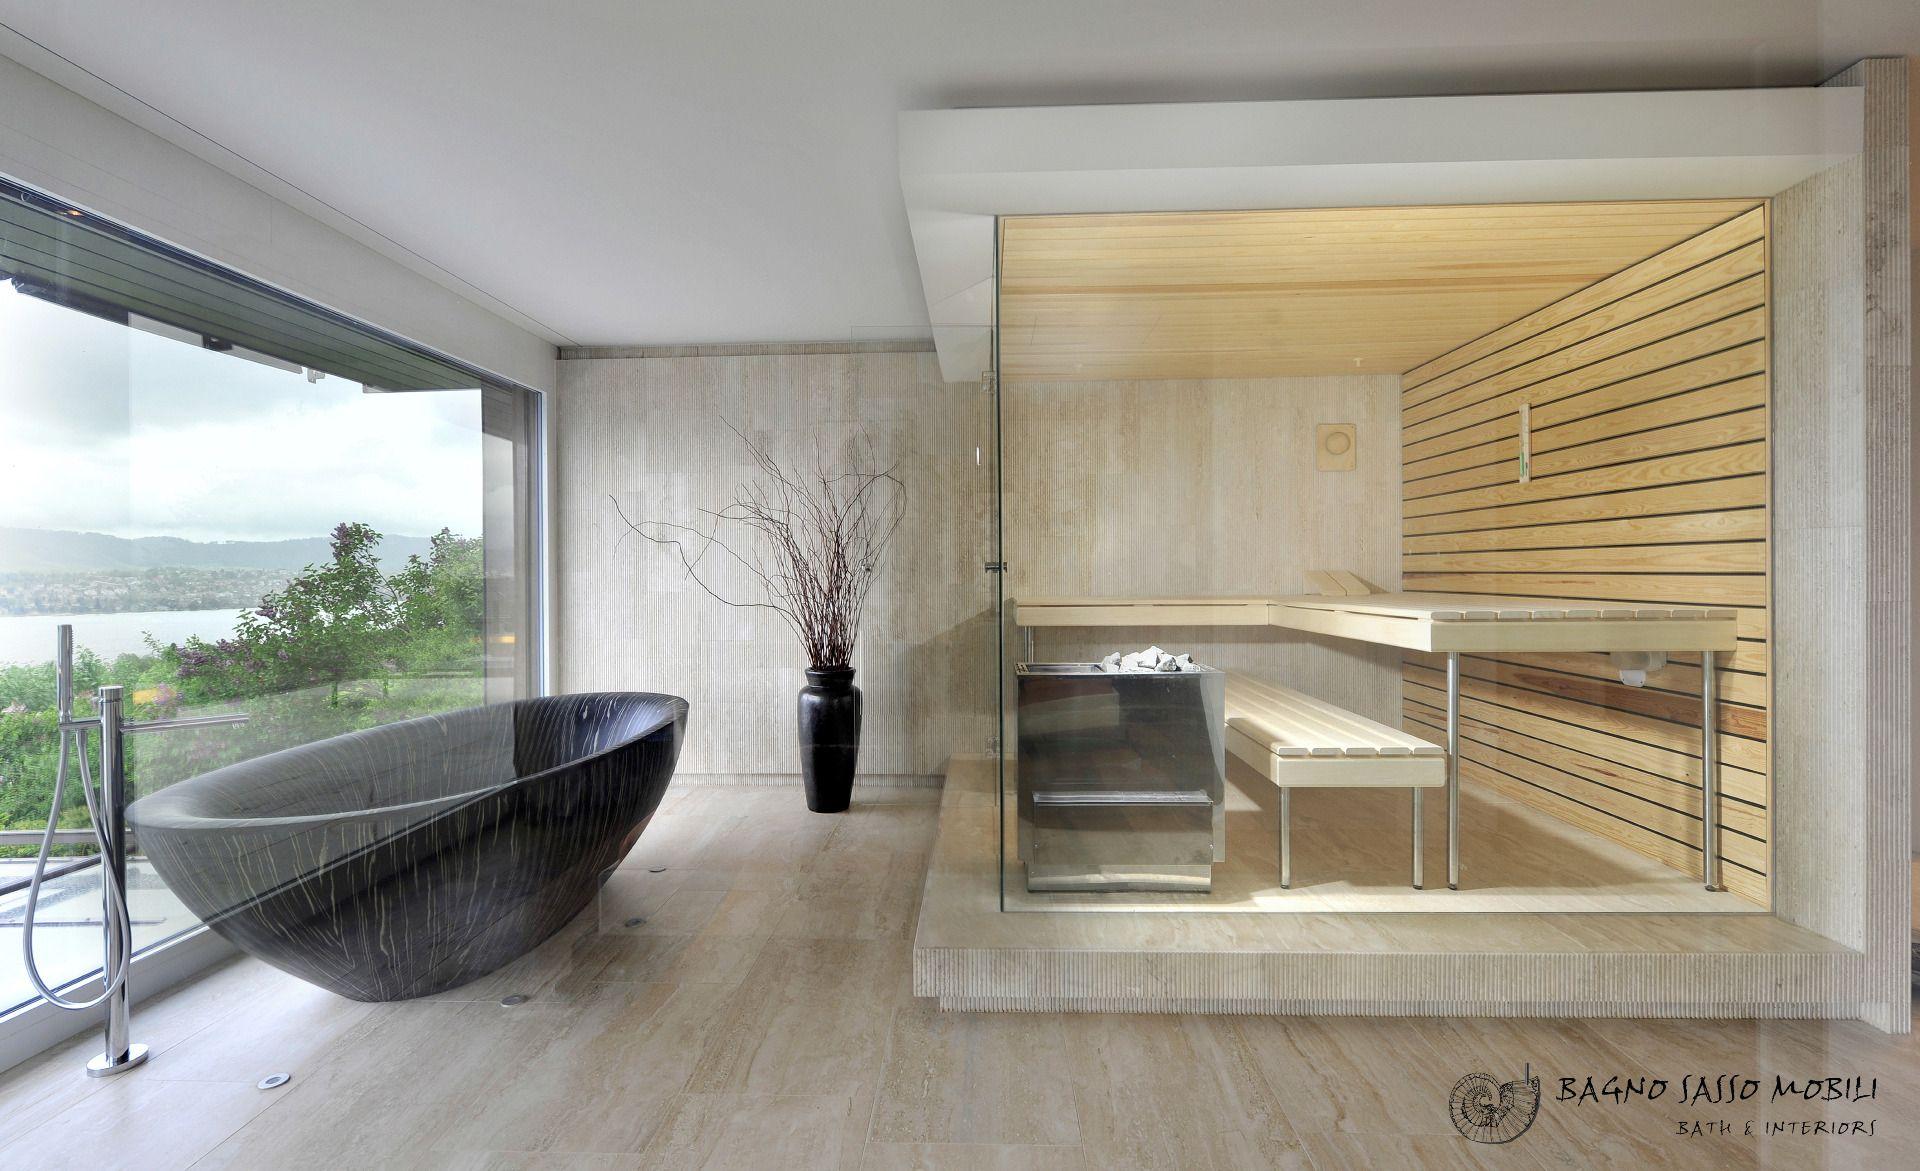 bagno sasso mobili terrace house near zurich wet areas pinterest badezimmer bad und baden. Black Bedroom Furniture Sets. Home Design Ideas